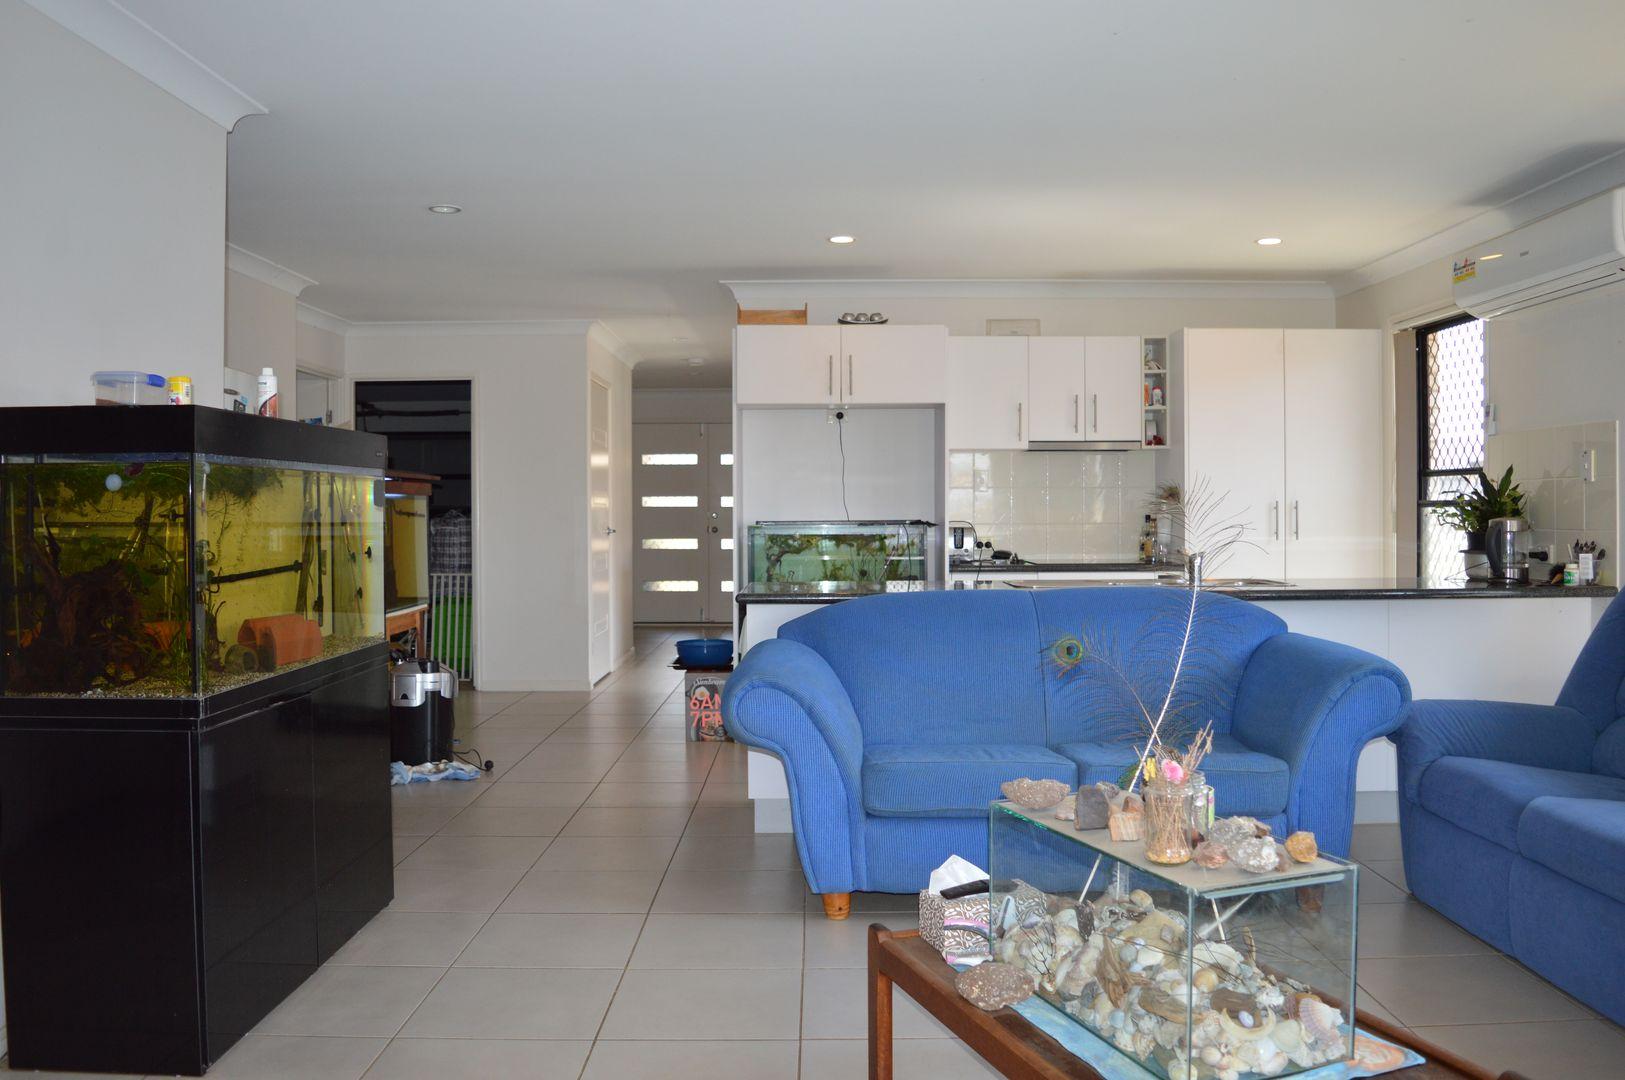 6 Cunningham Avenue, Laidley North QLD 4341, Image 2